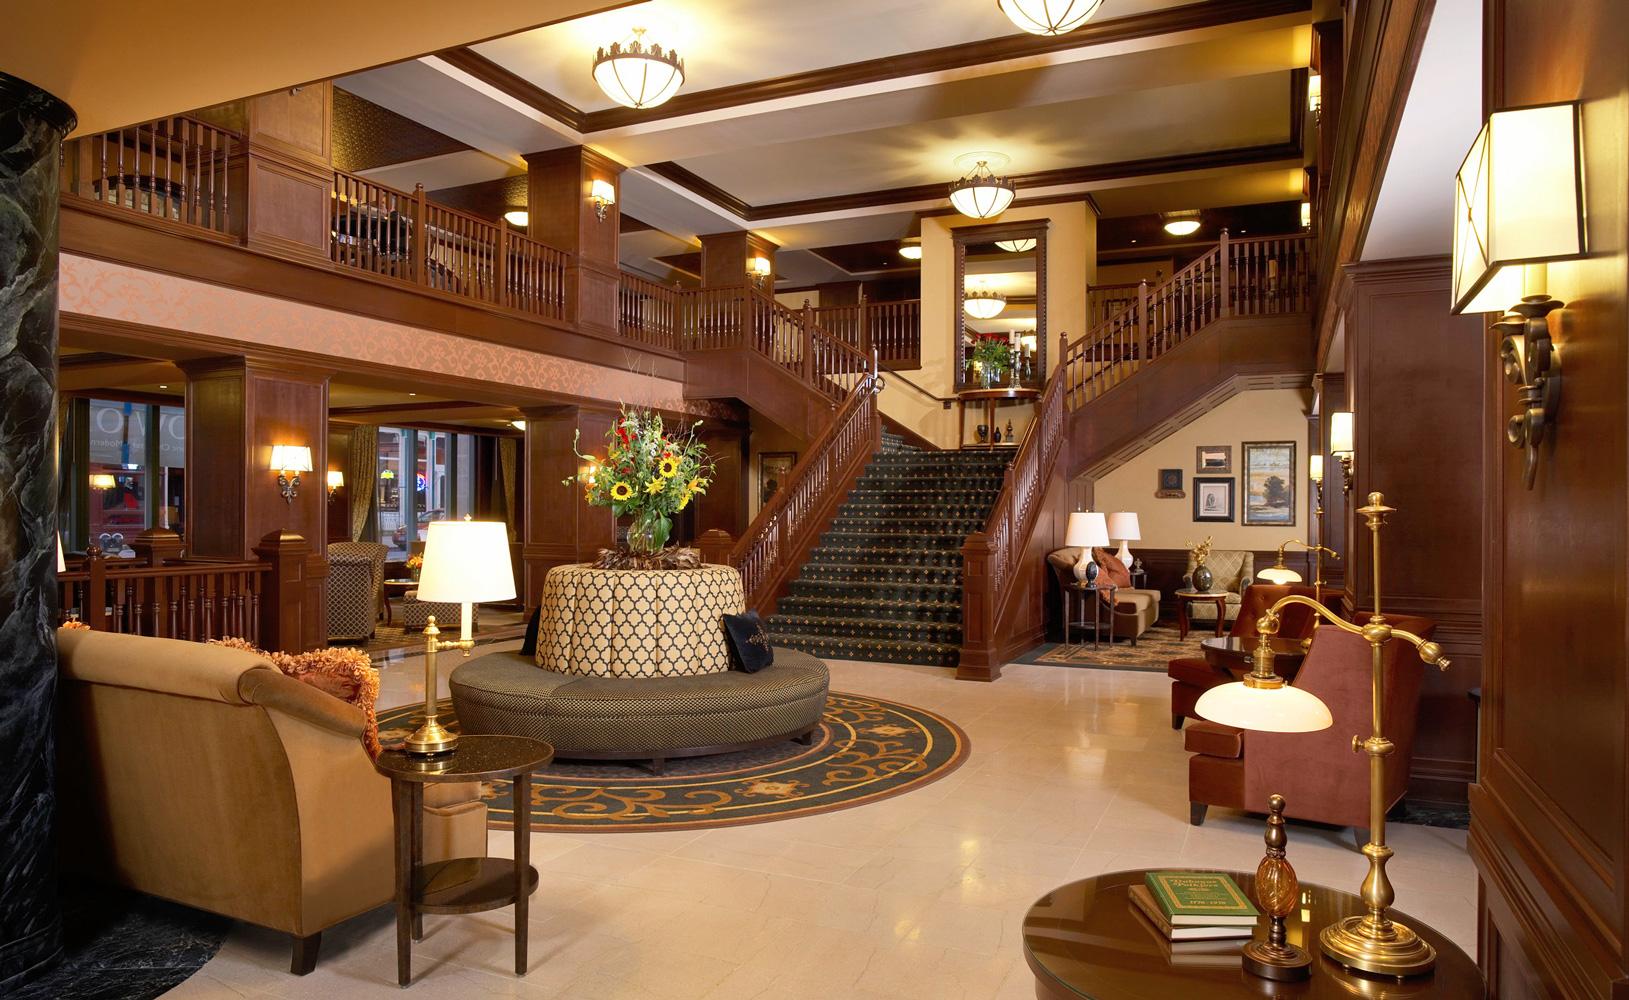 Hotel Julien Dubuque lobby. Photo courtesy of Hotel Julien Dubuque.